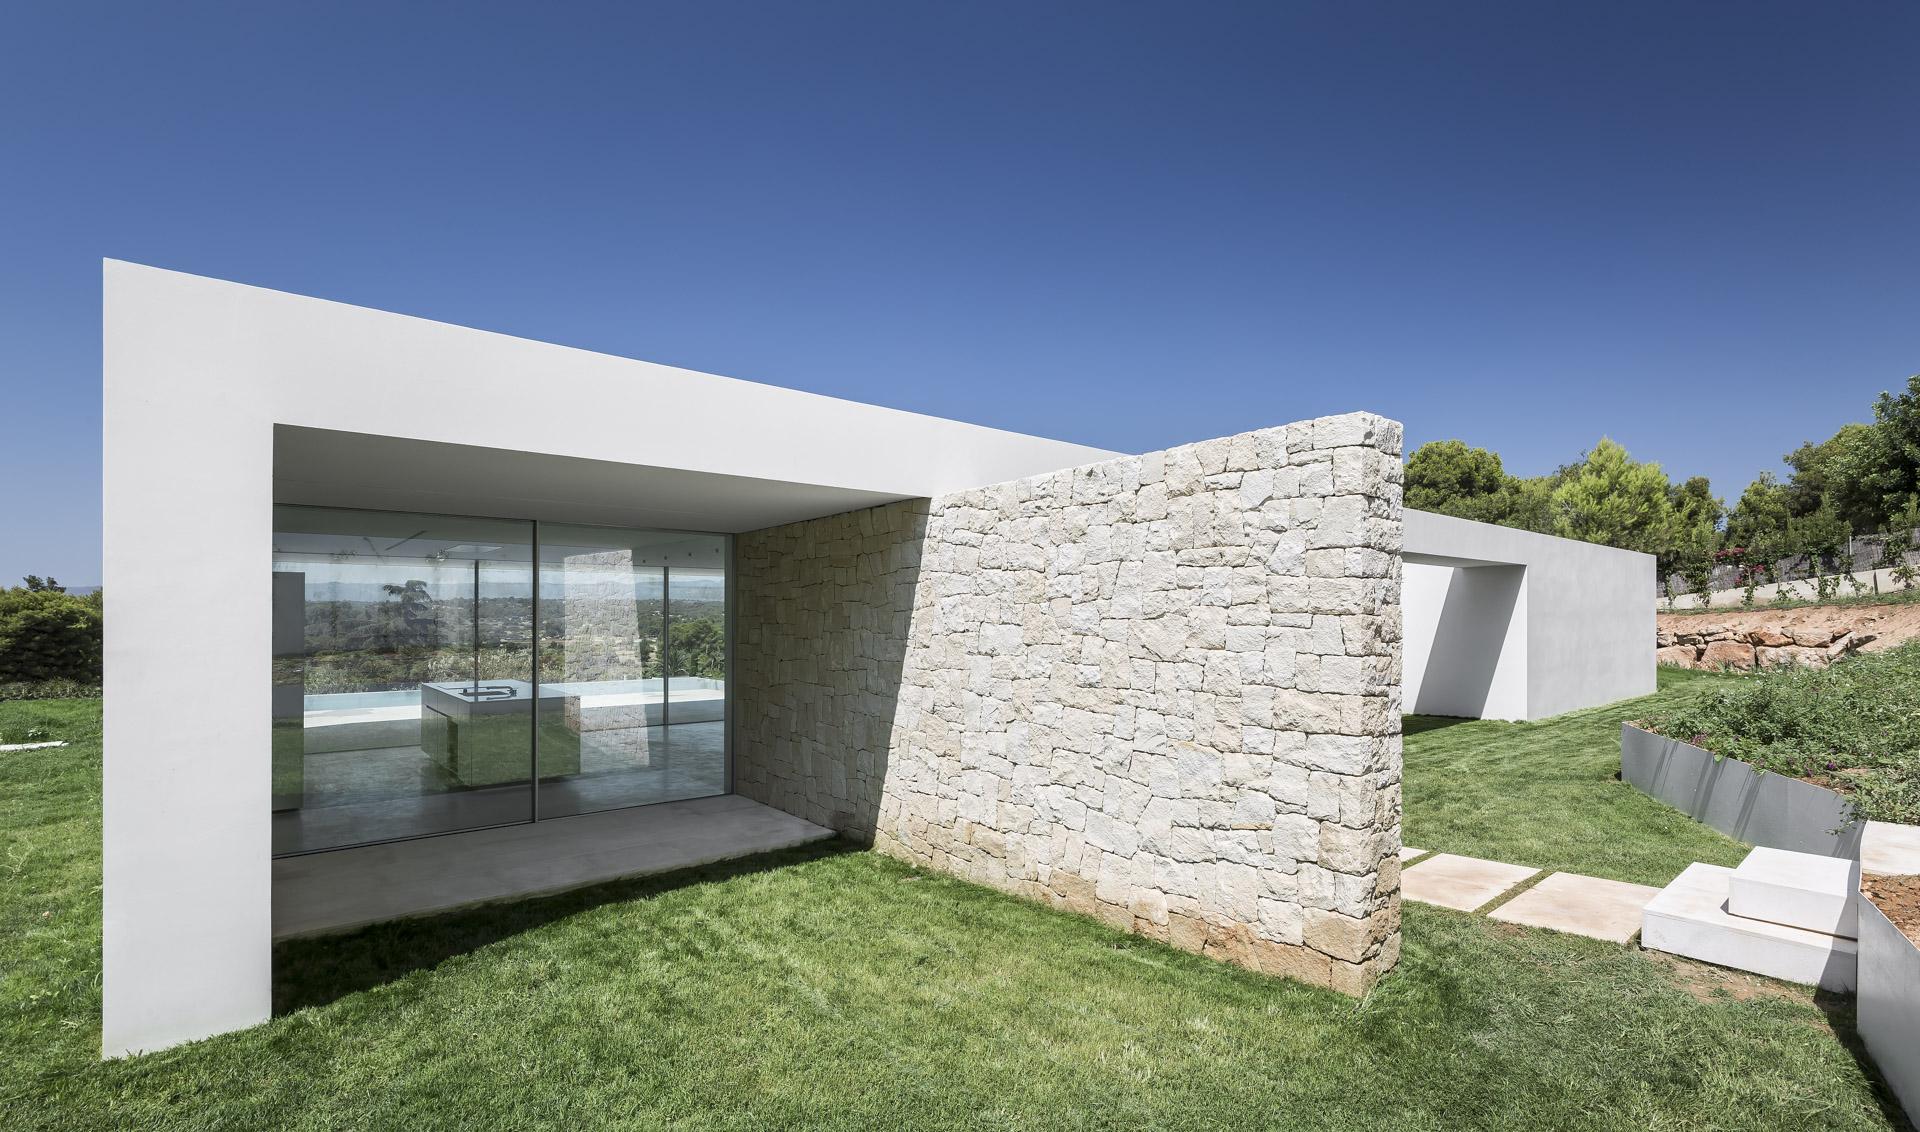 fotografia-arquitectura-valencia-german-cabo-gallardo-llopis-villamarchante-vivienda-04